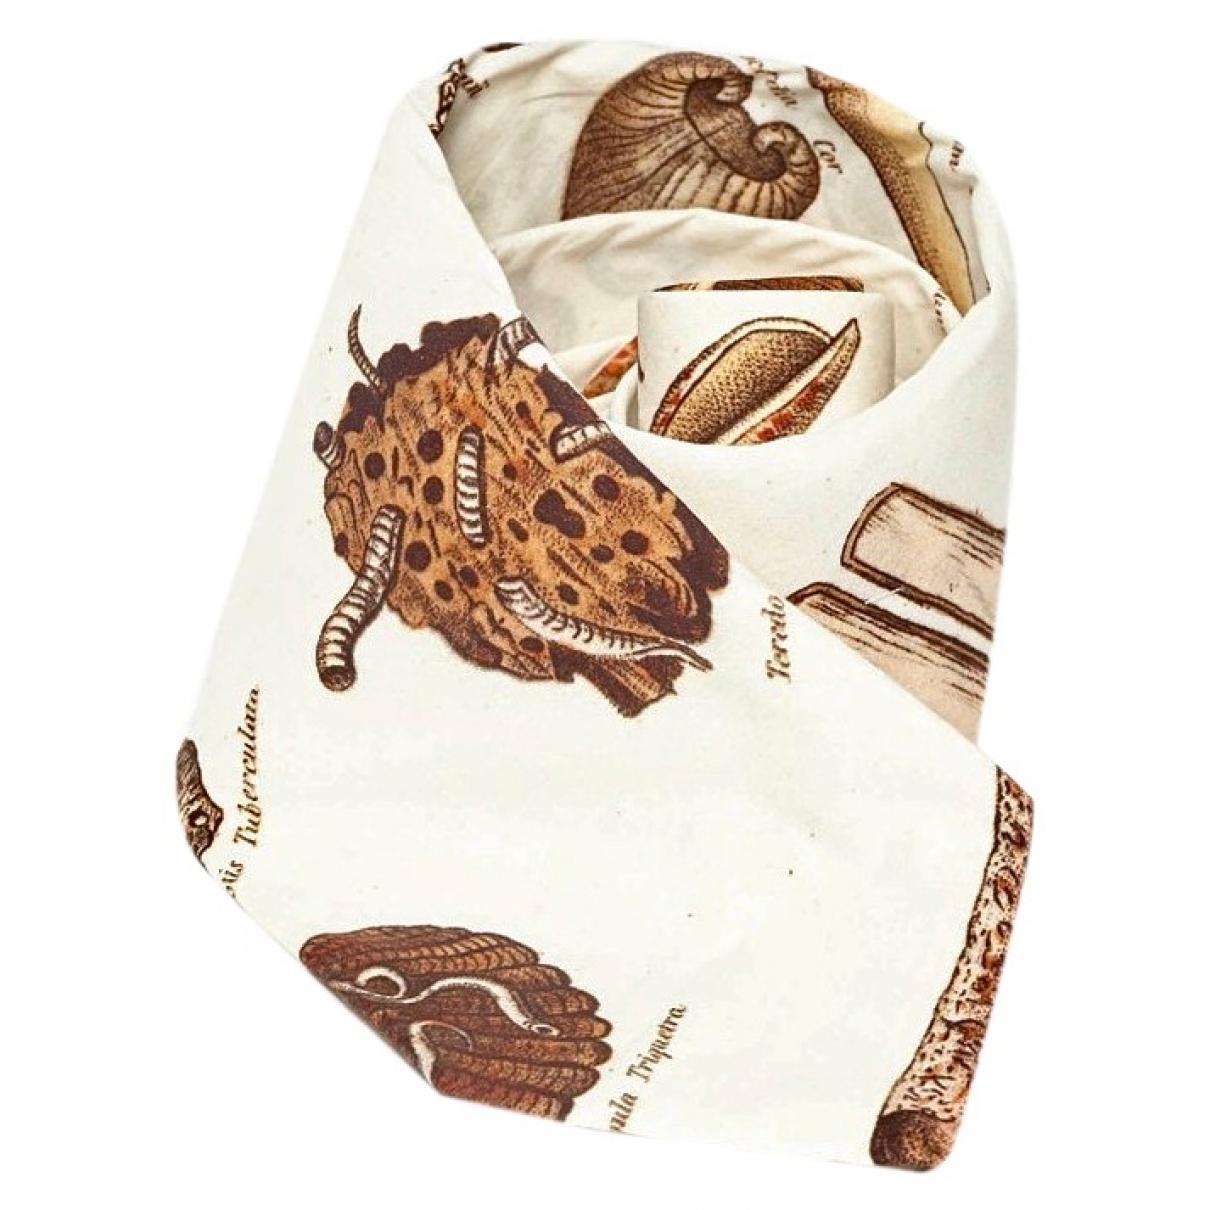 Paul Harnden Shoemakers \N Beige Cotton Ties for Men \N